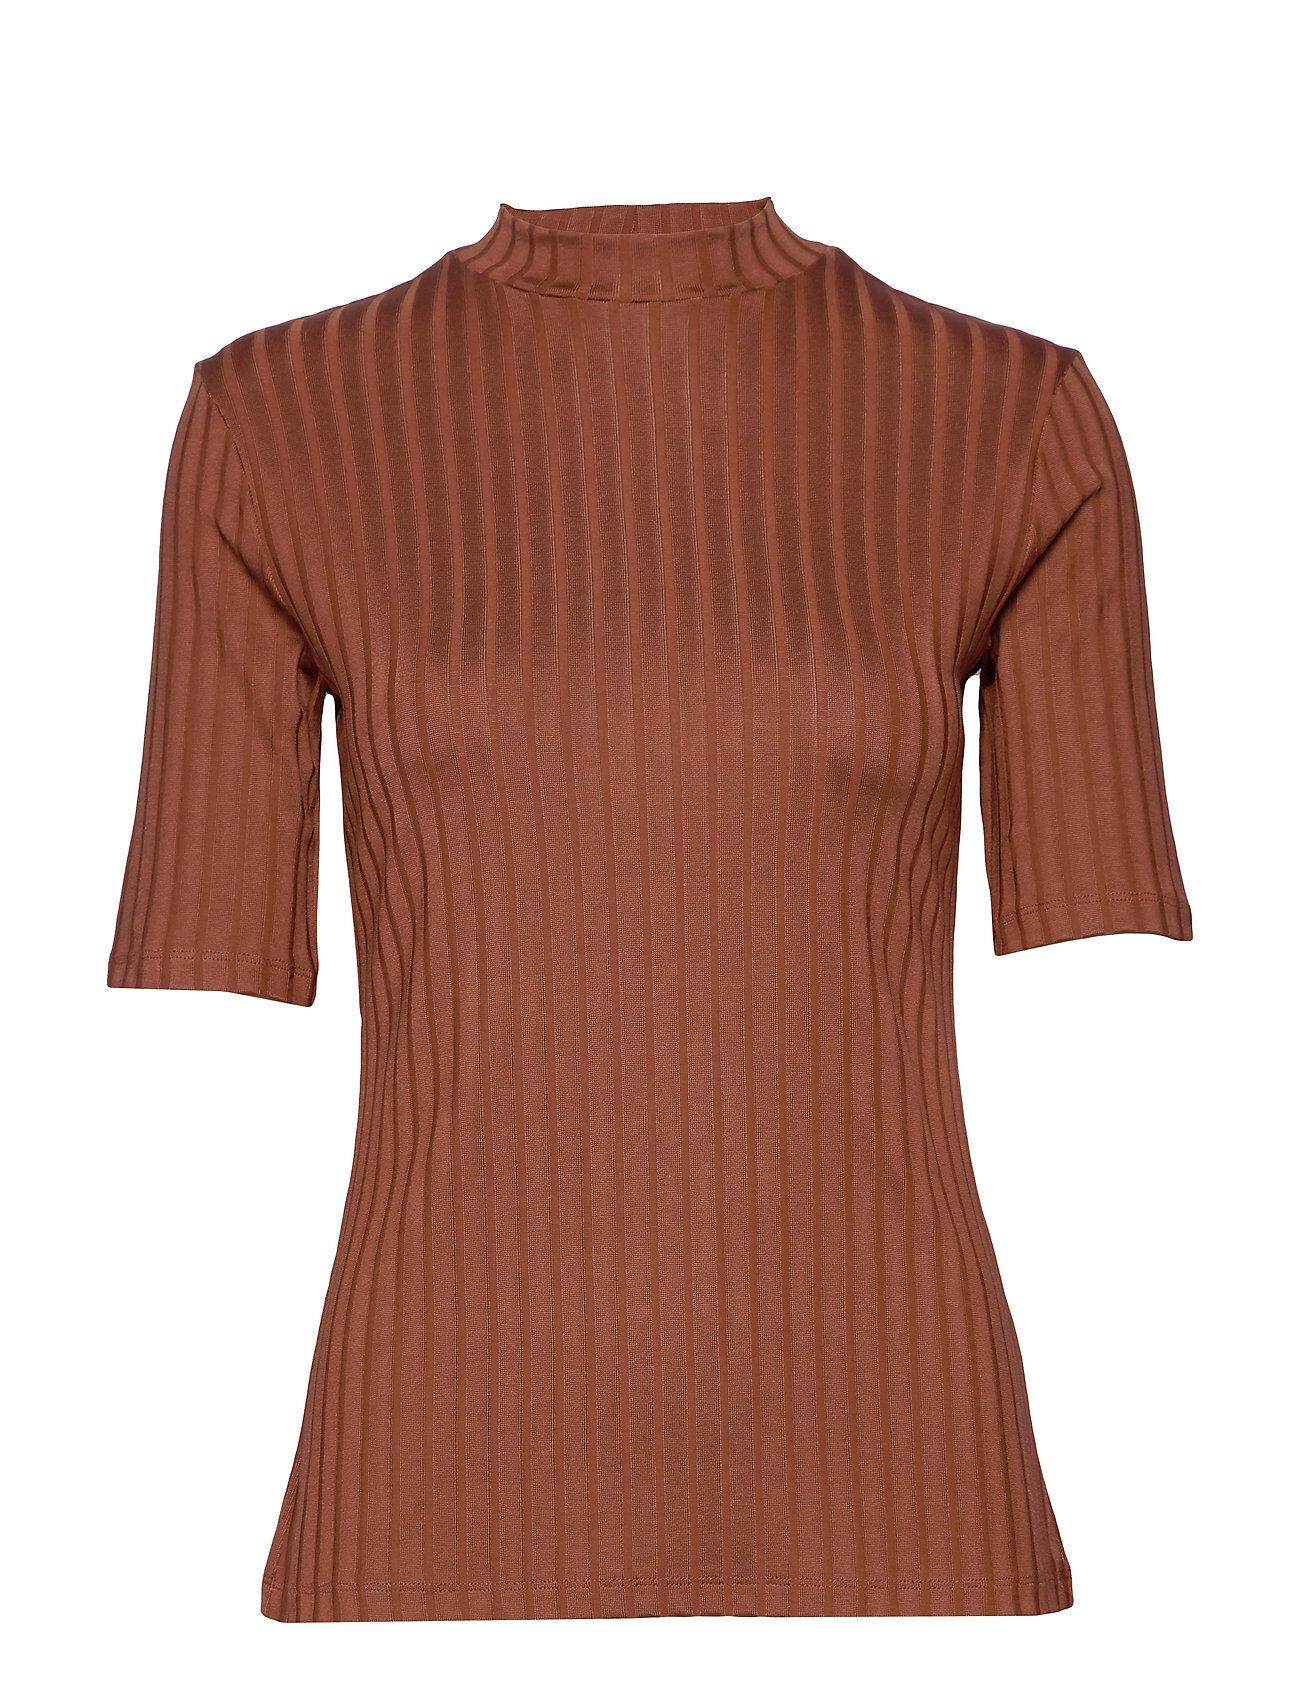 Residus Moss Rib Top T-shirts & Tops Short-sleeved Ruskea Residus